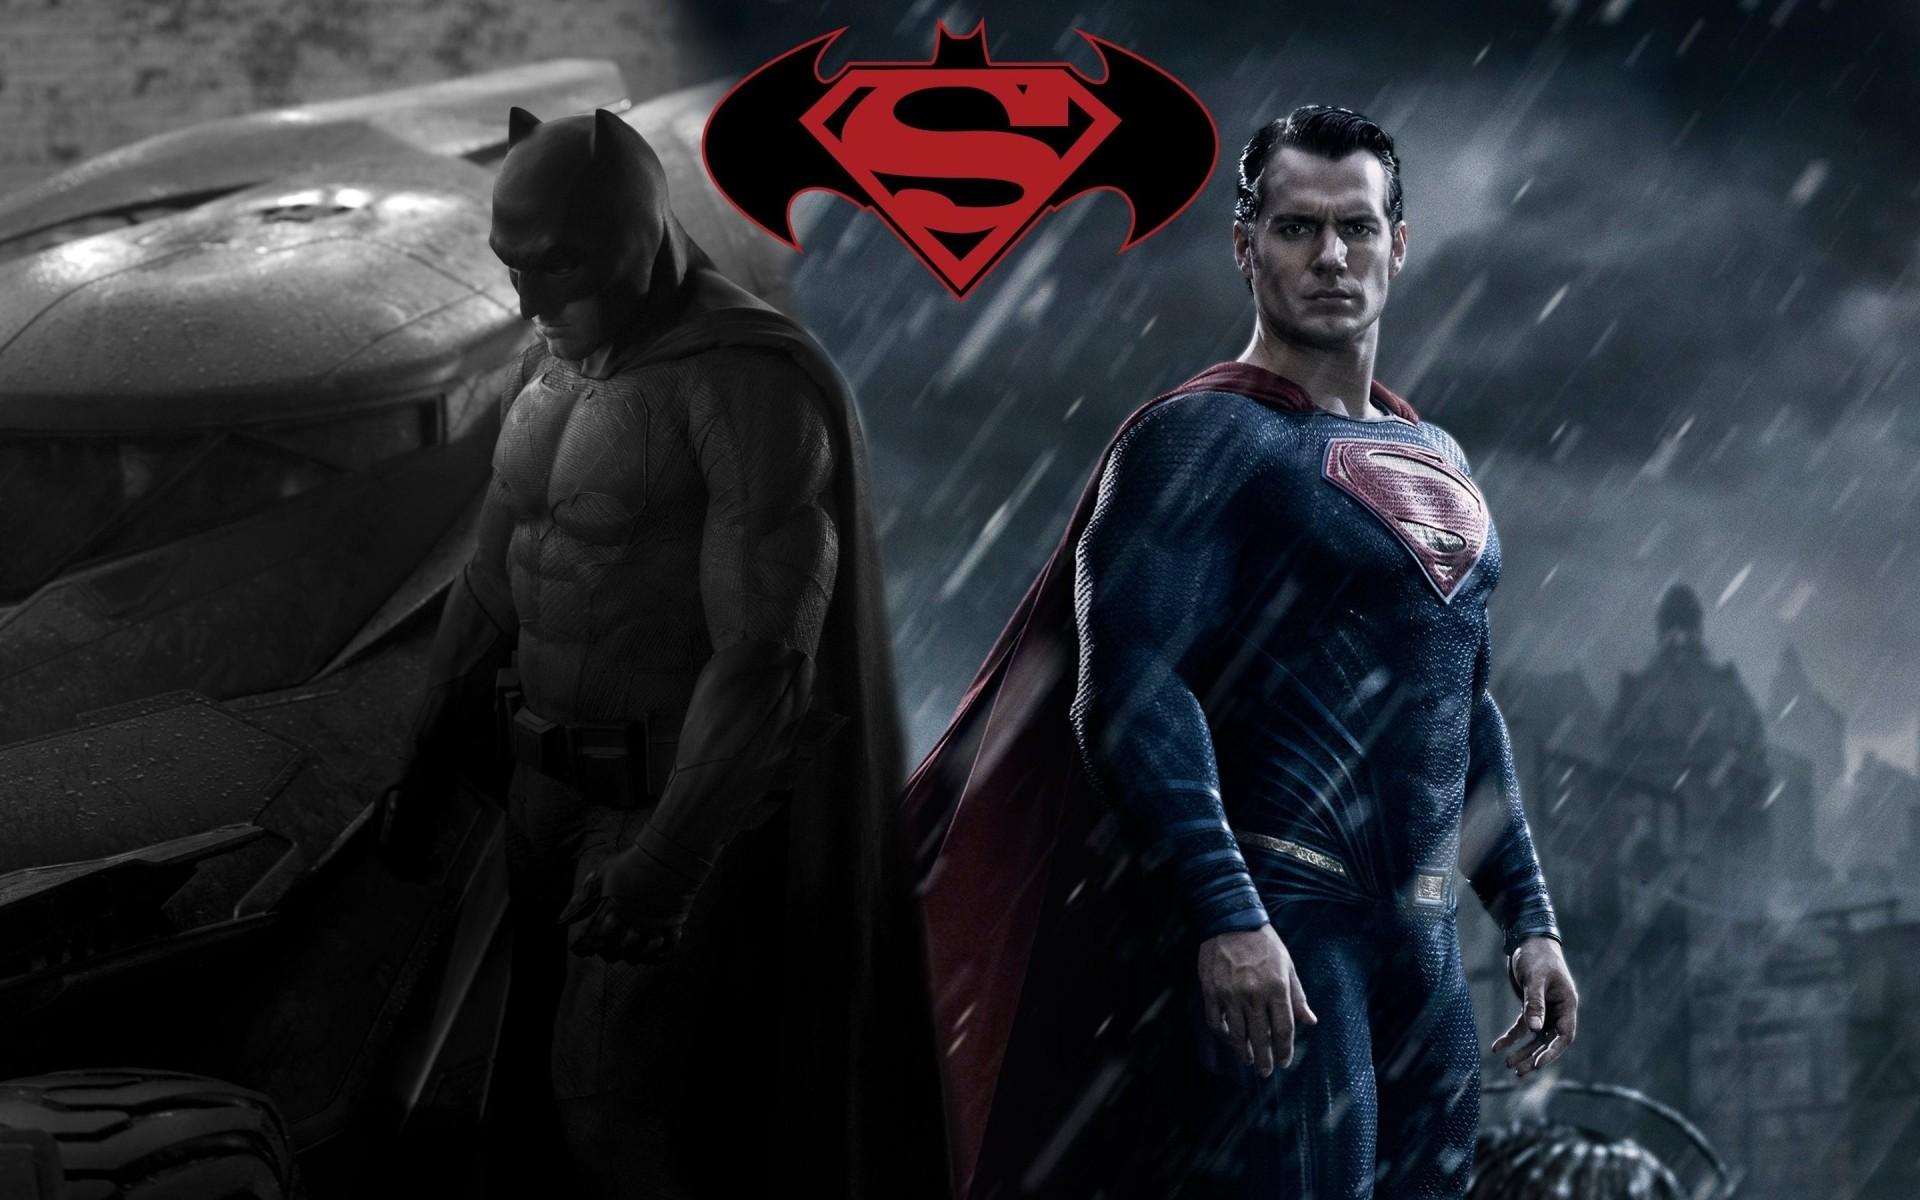 Batman Vs Superman Fan Art Android Wallpapers